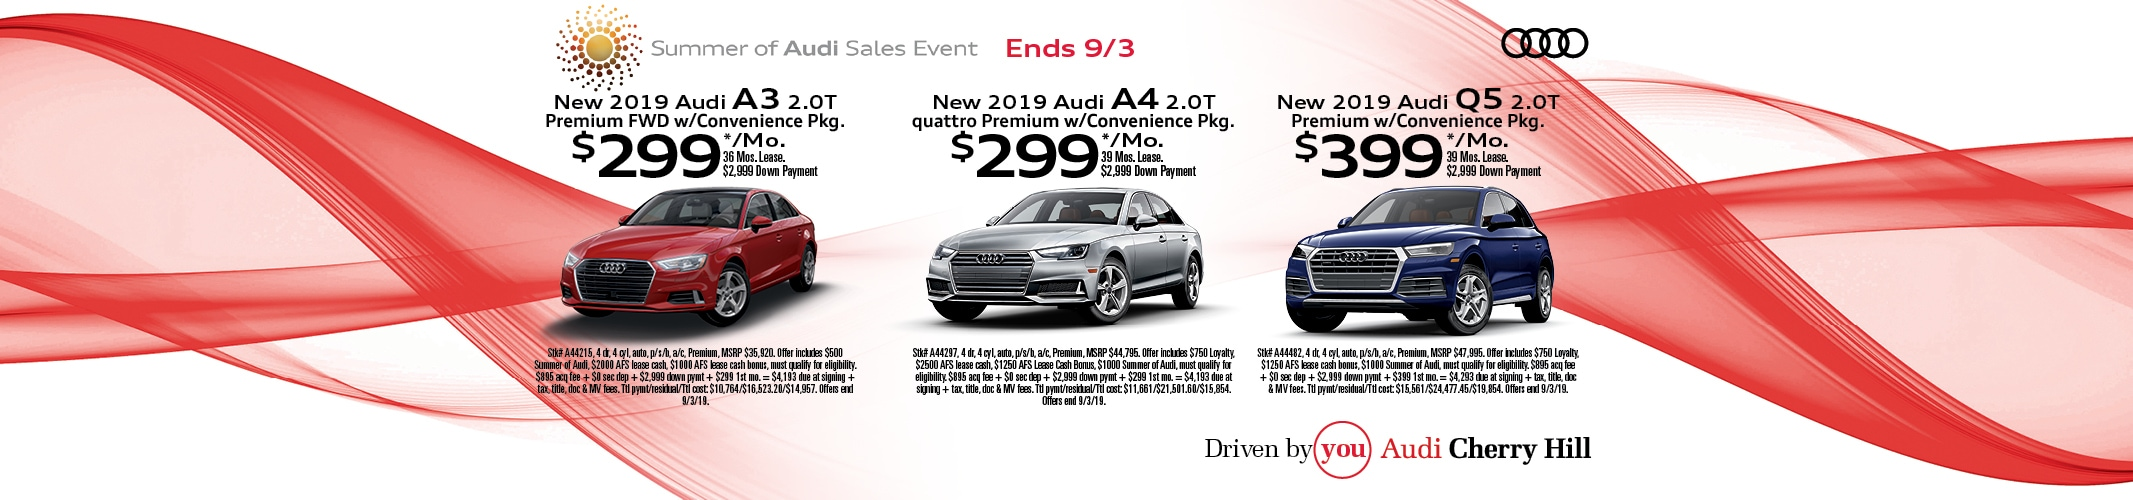 New Audi Dealership Philadelphia, Cherry Hill NJ | Used Audi Dealers